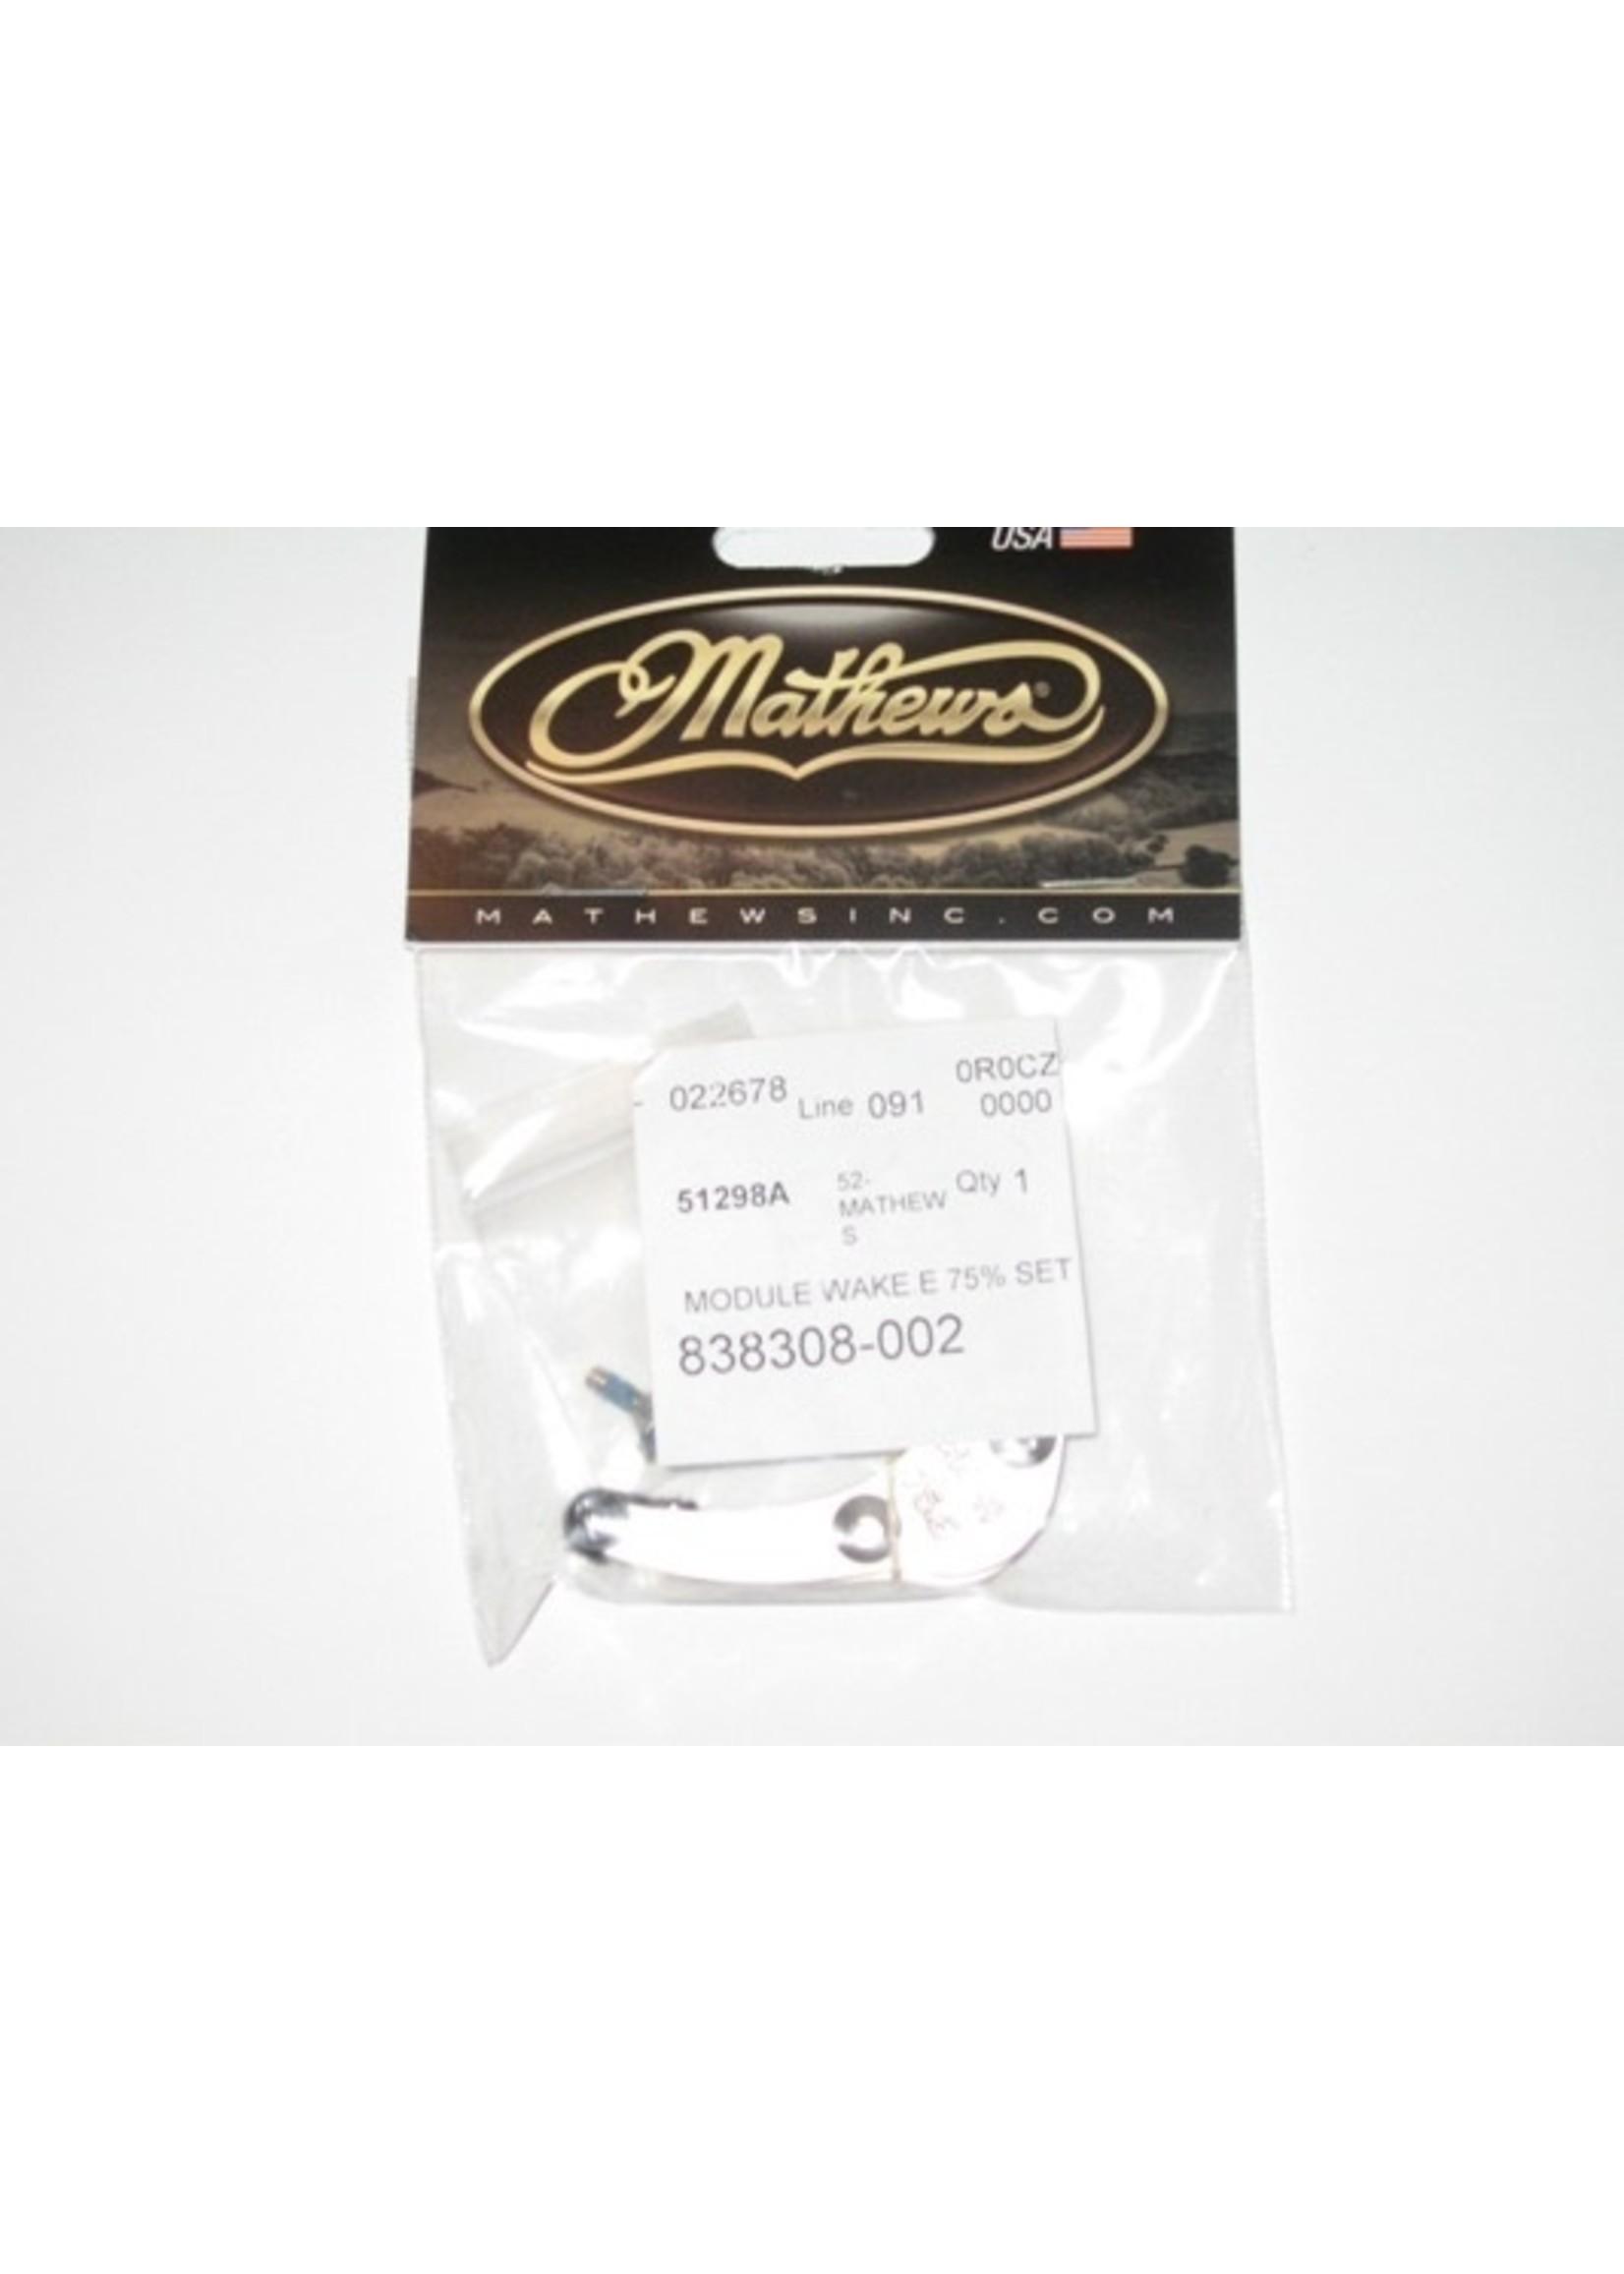 Mathews Inc Mathews Wake Modules